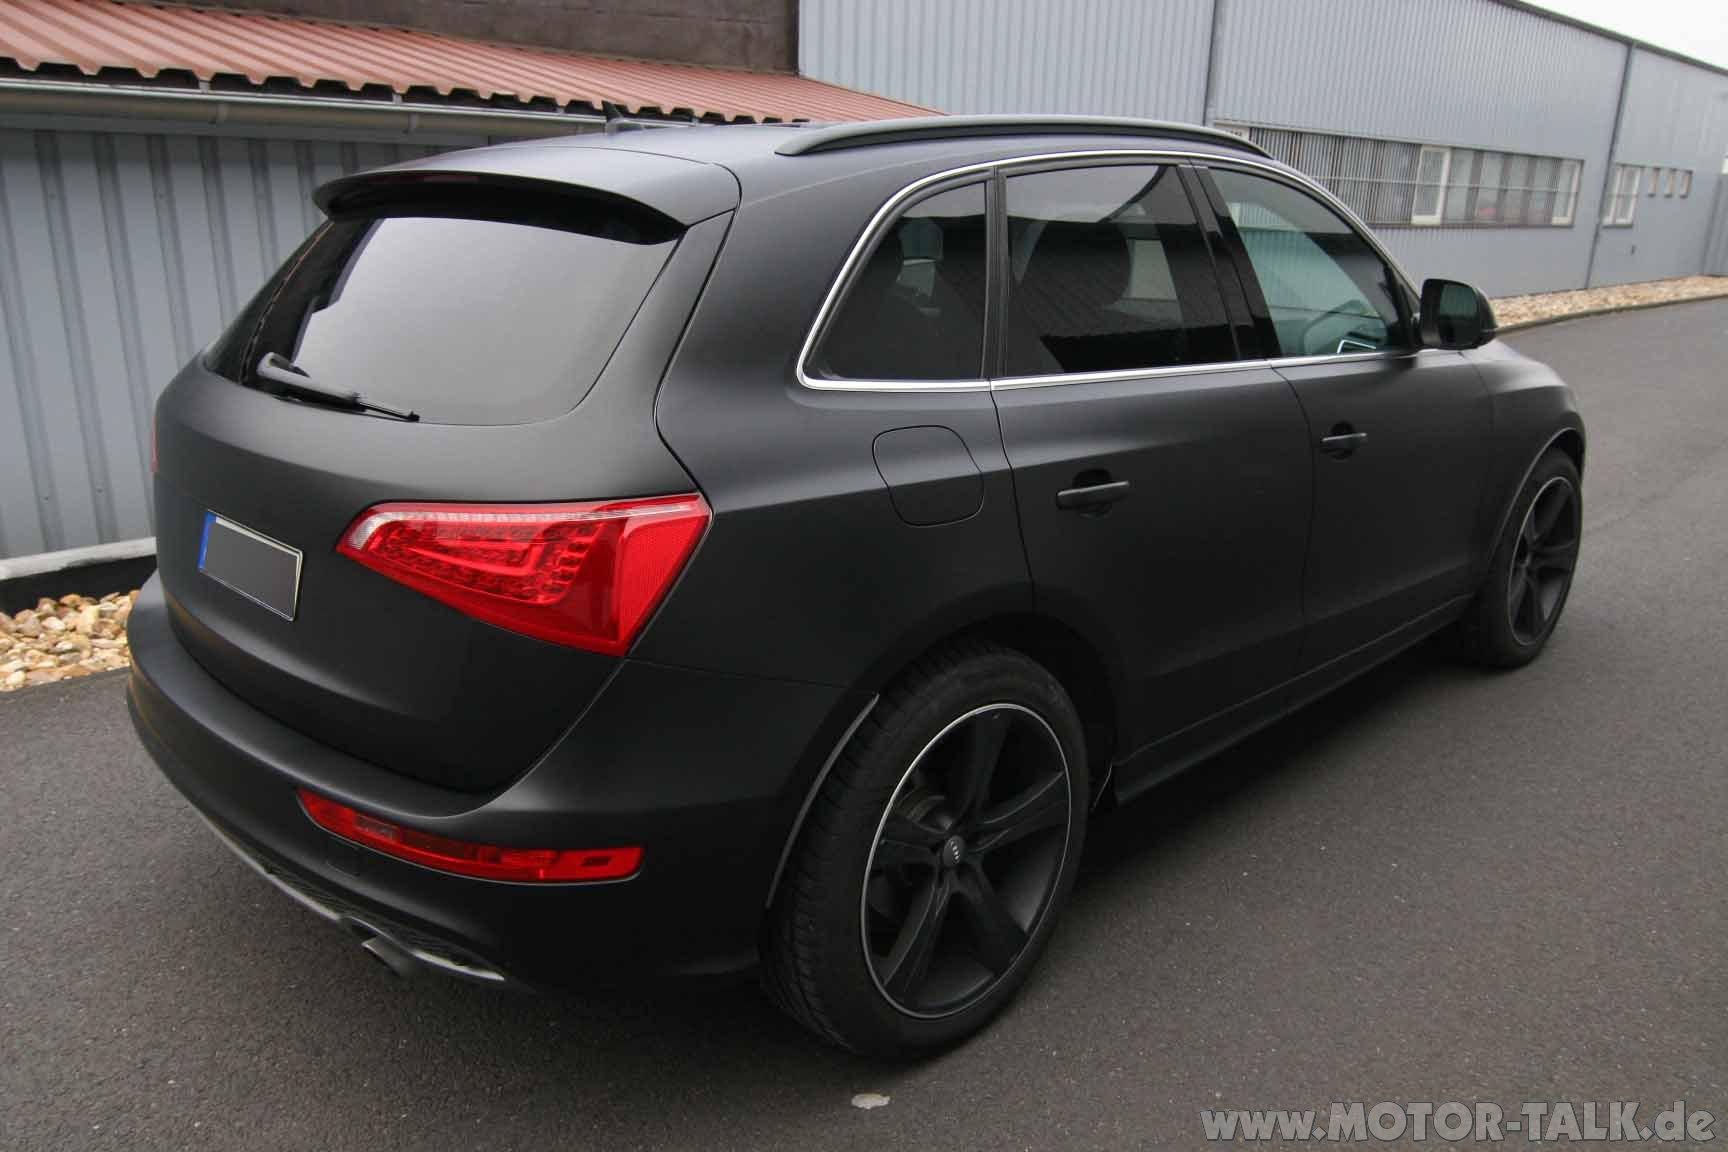 Img 4891 Q5 Schwarz Matt Audi Q5 203269799